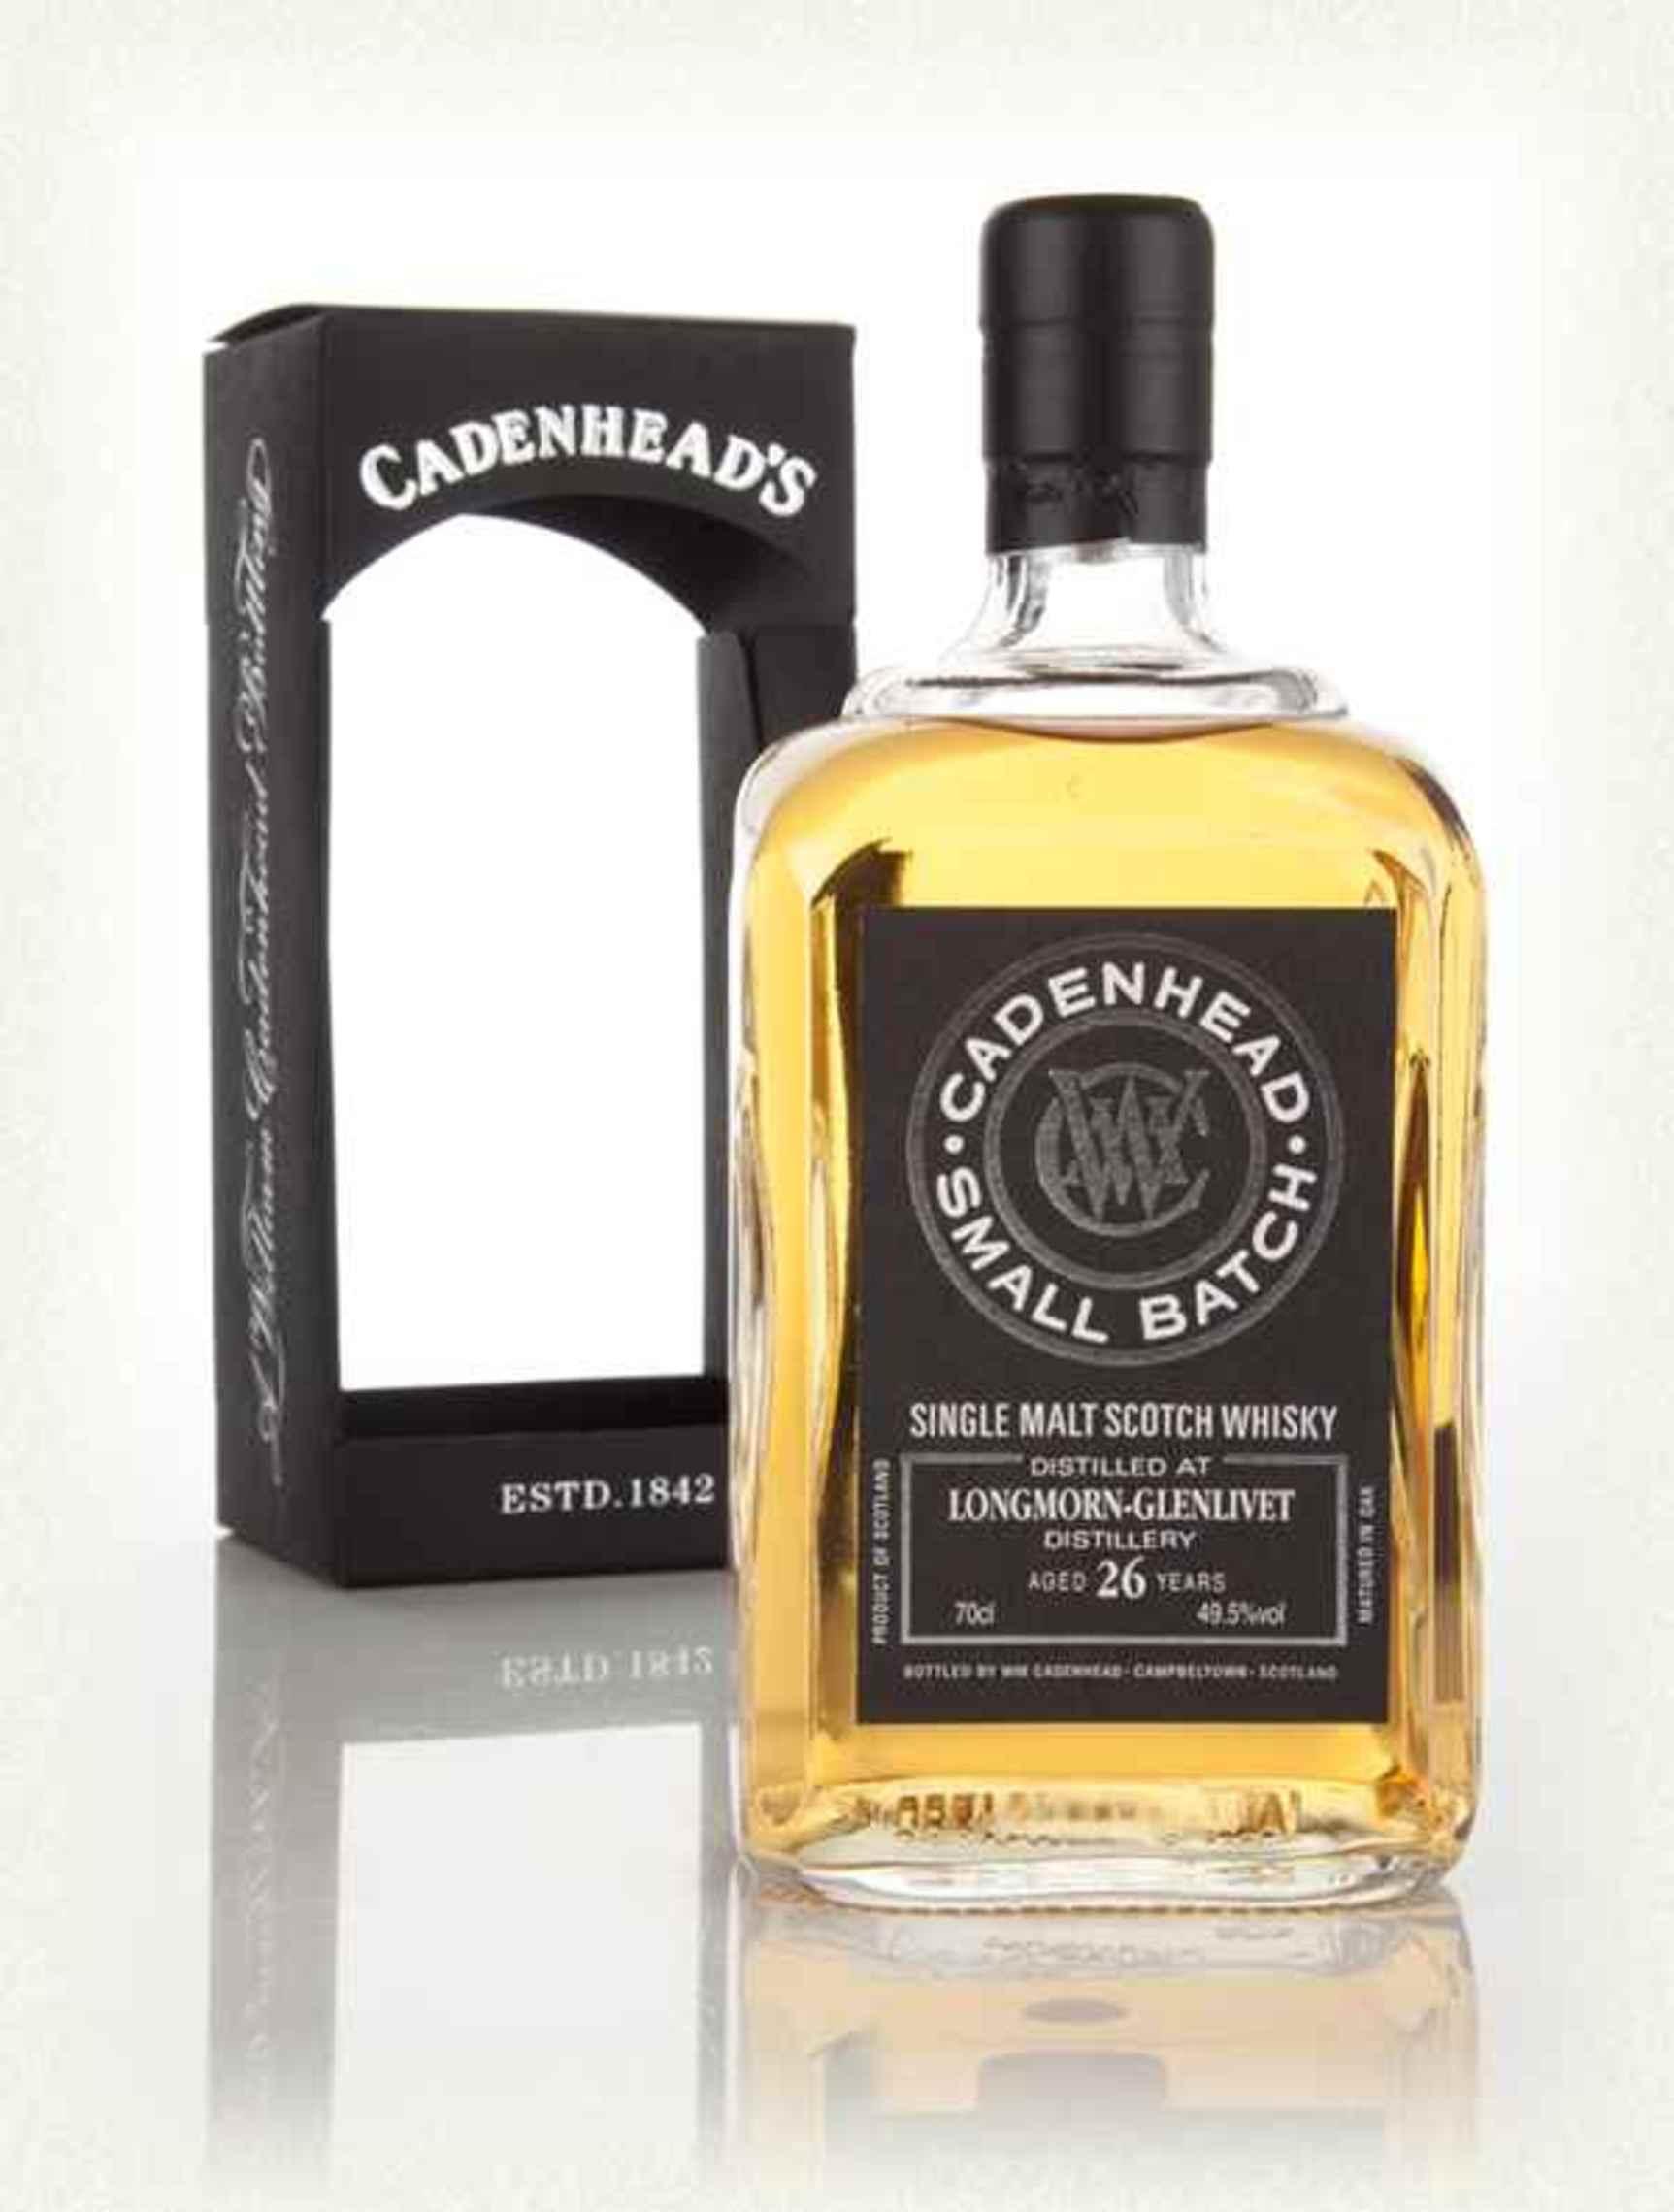 Longmorn 26yo, 49.5% by Cadenheads